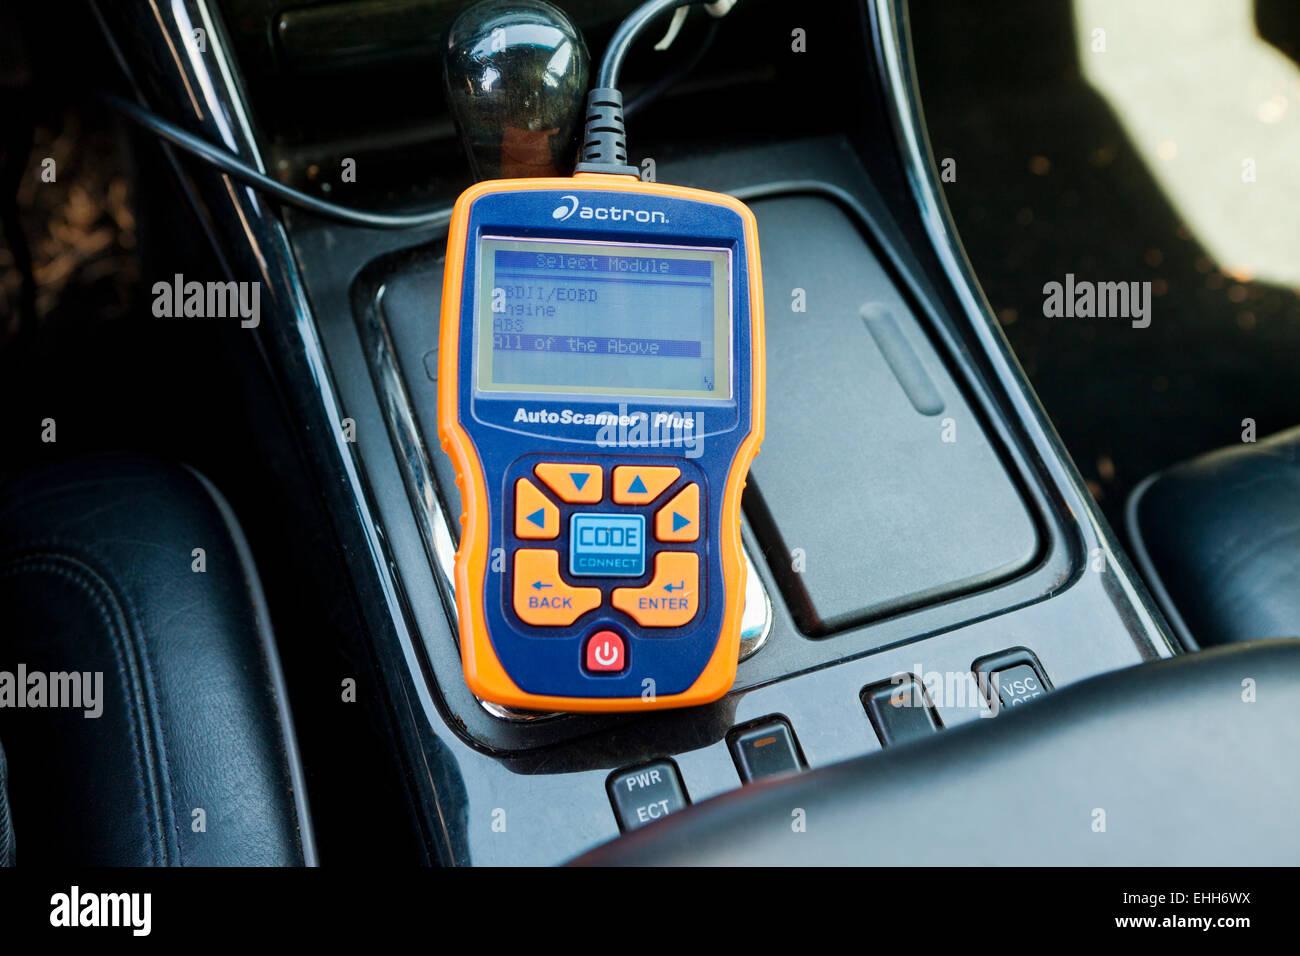 OBD II automotive diagnostics tool - USA - Stock Image